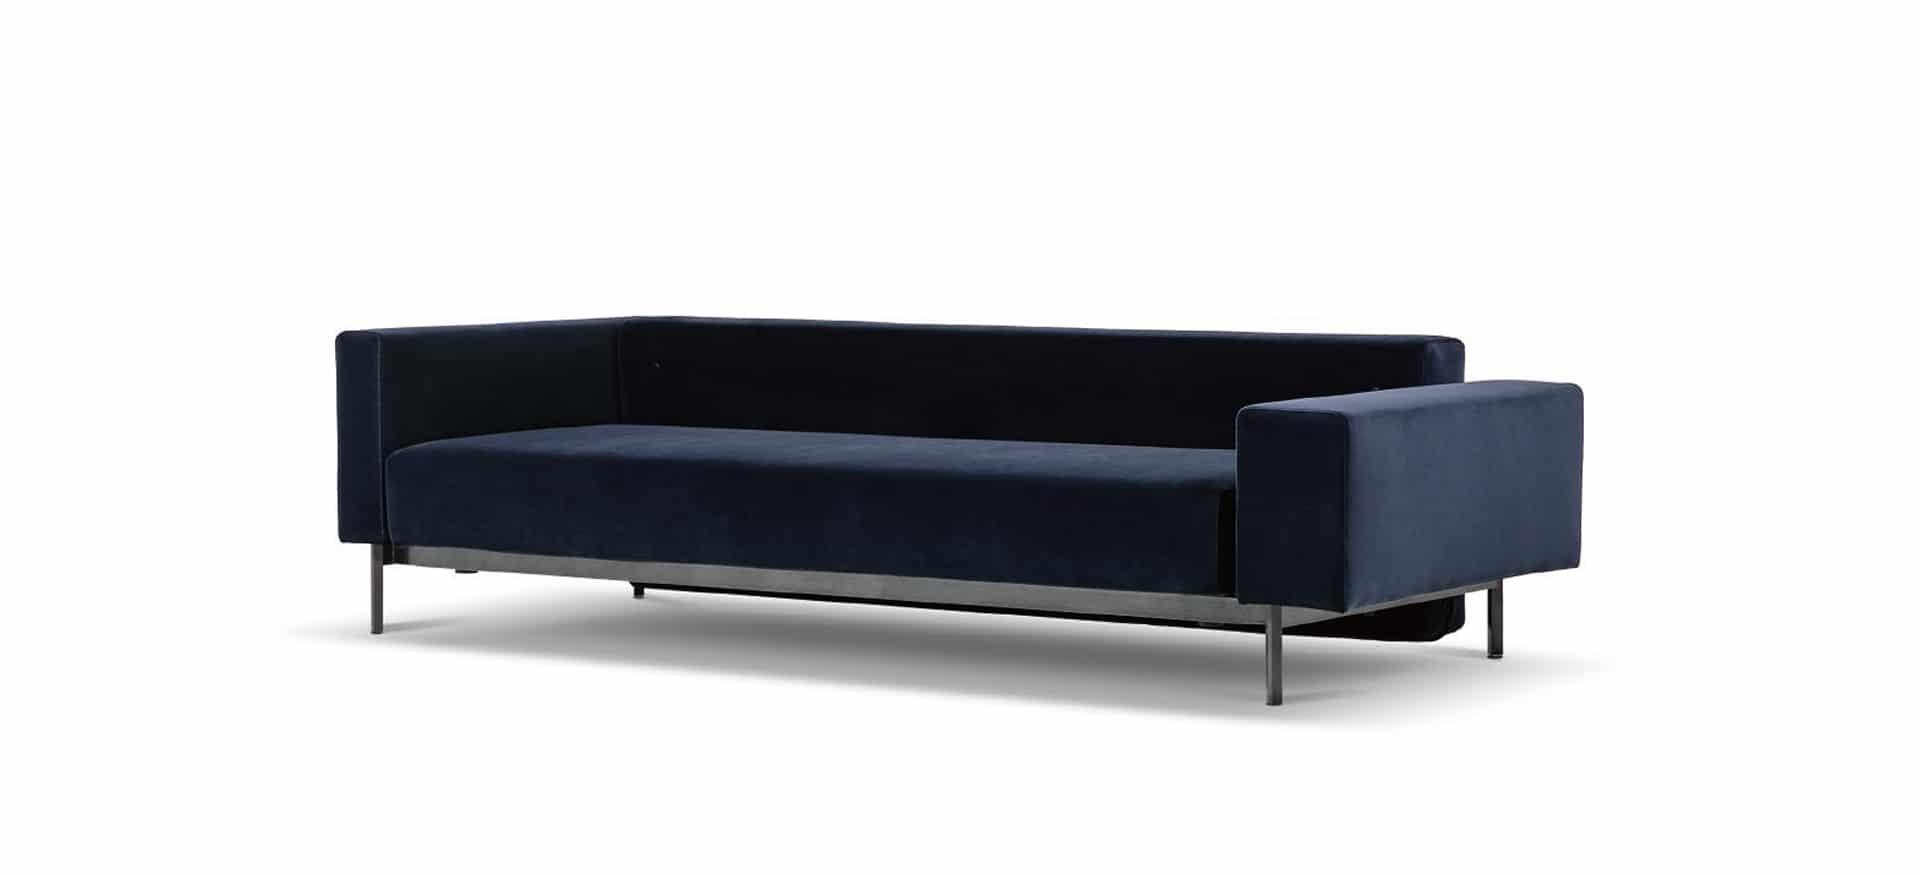 Lola sofa bed